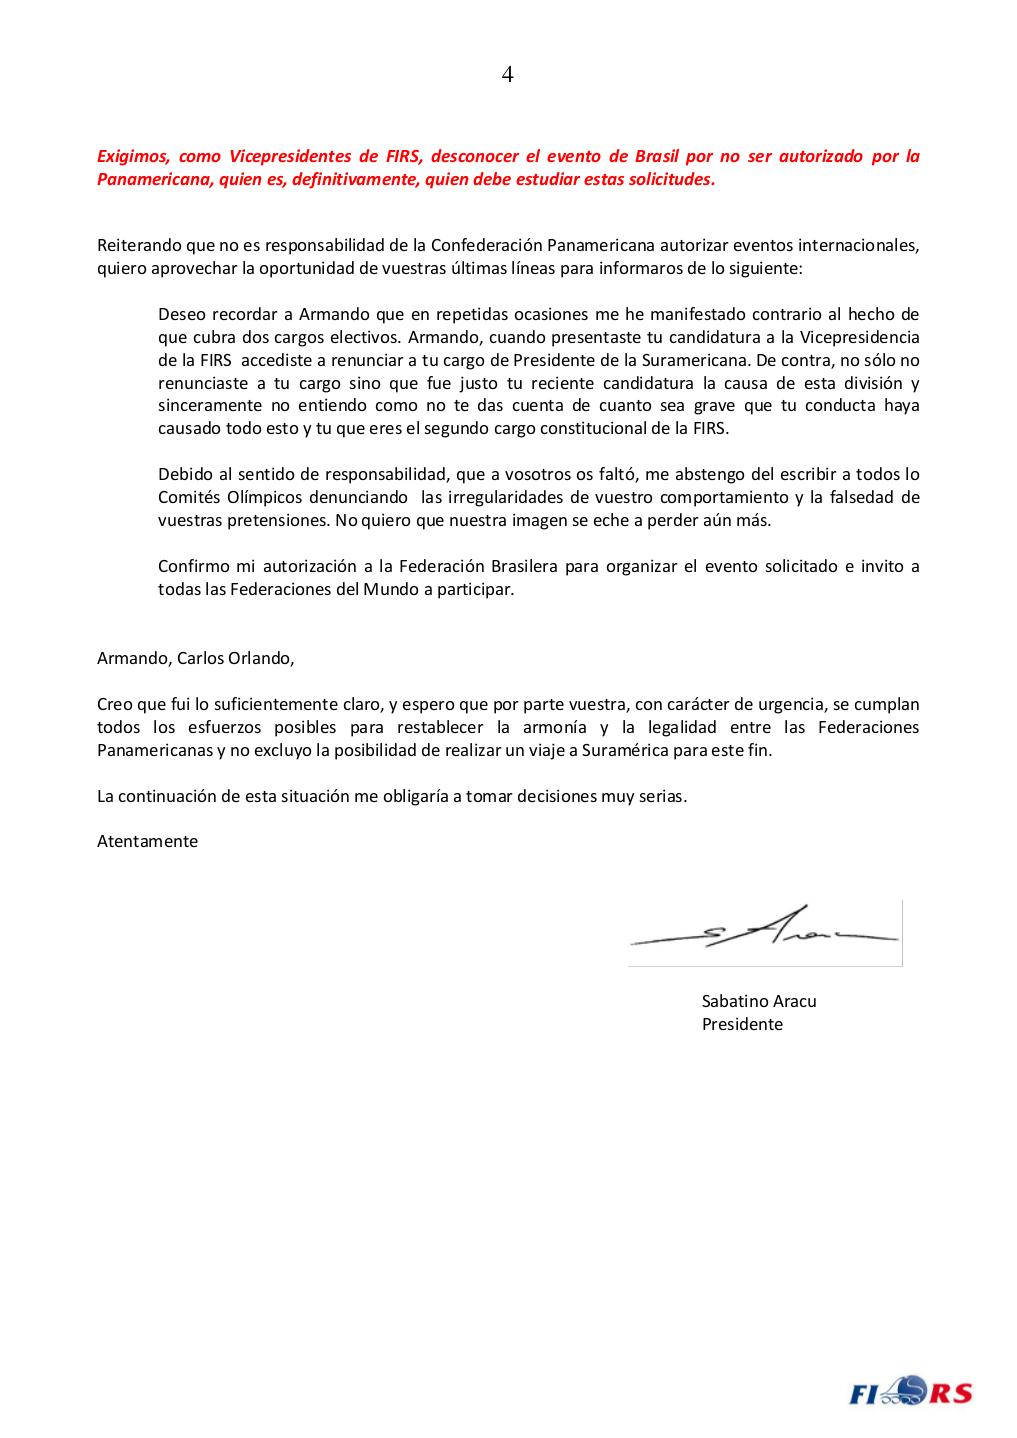 Carta del Presidente FIRS-4-4